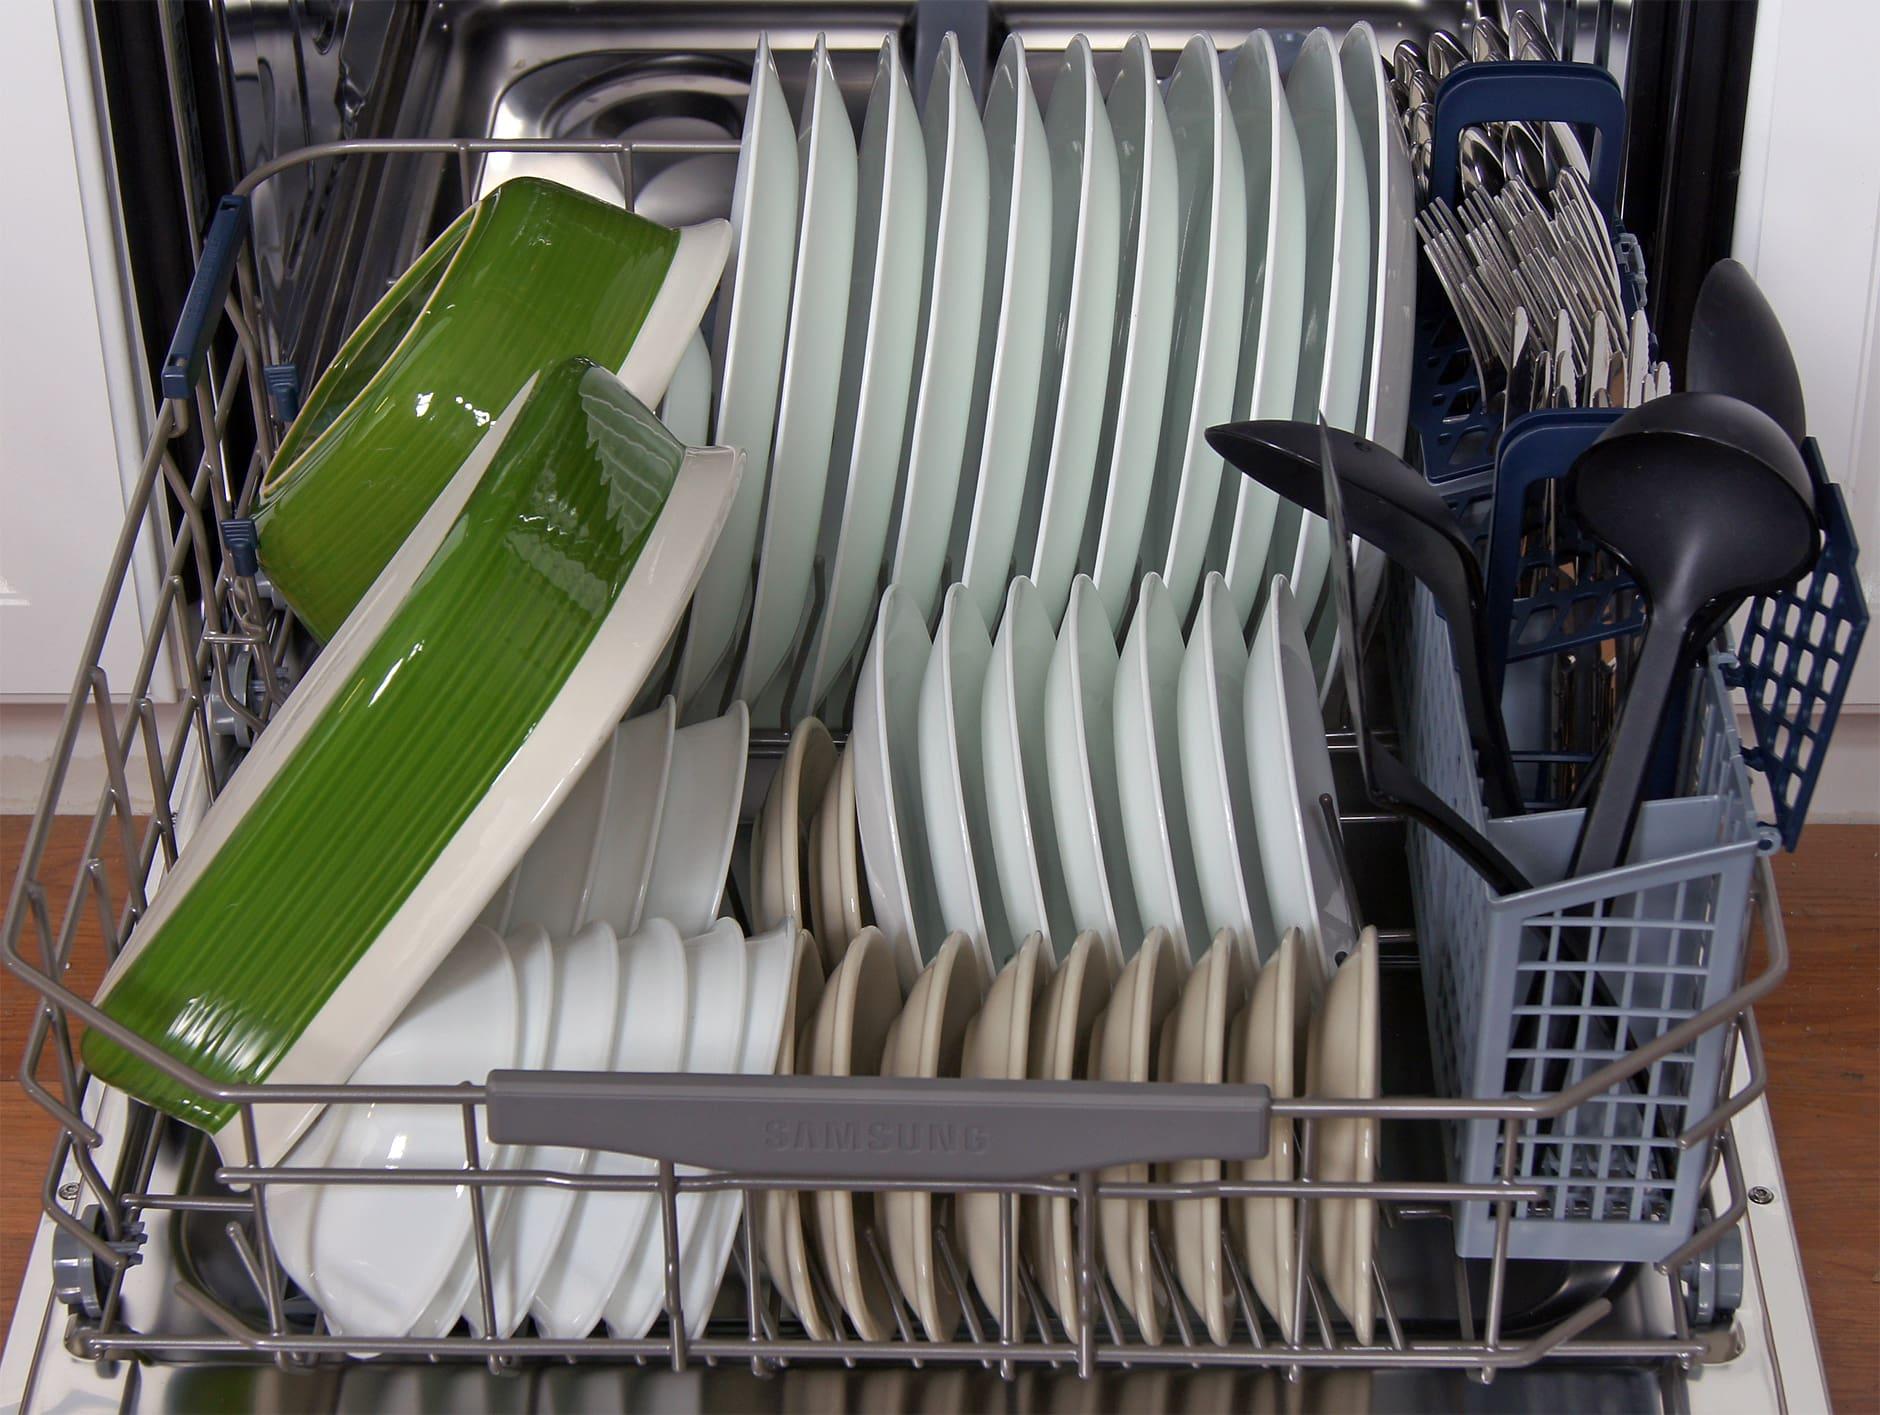 Samsung DW80F600UTS Dishwasher Review - Reviewed.com Dishwashers